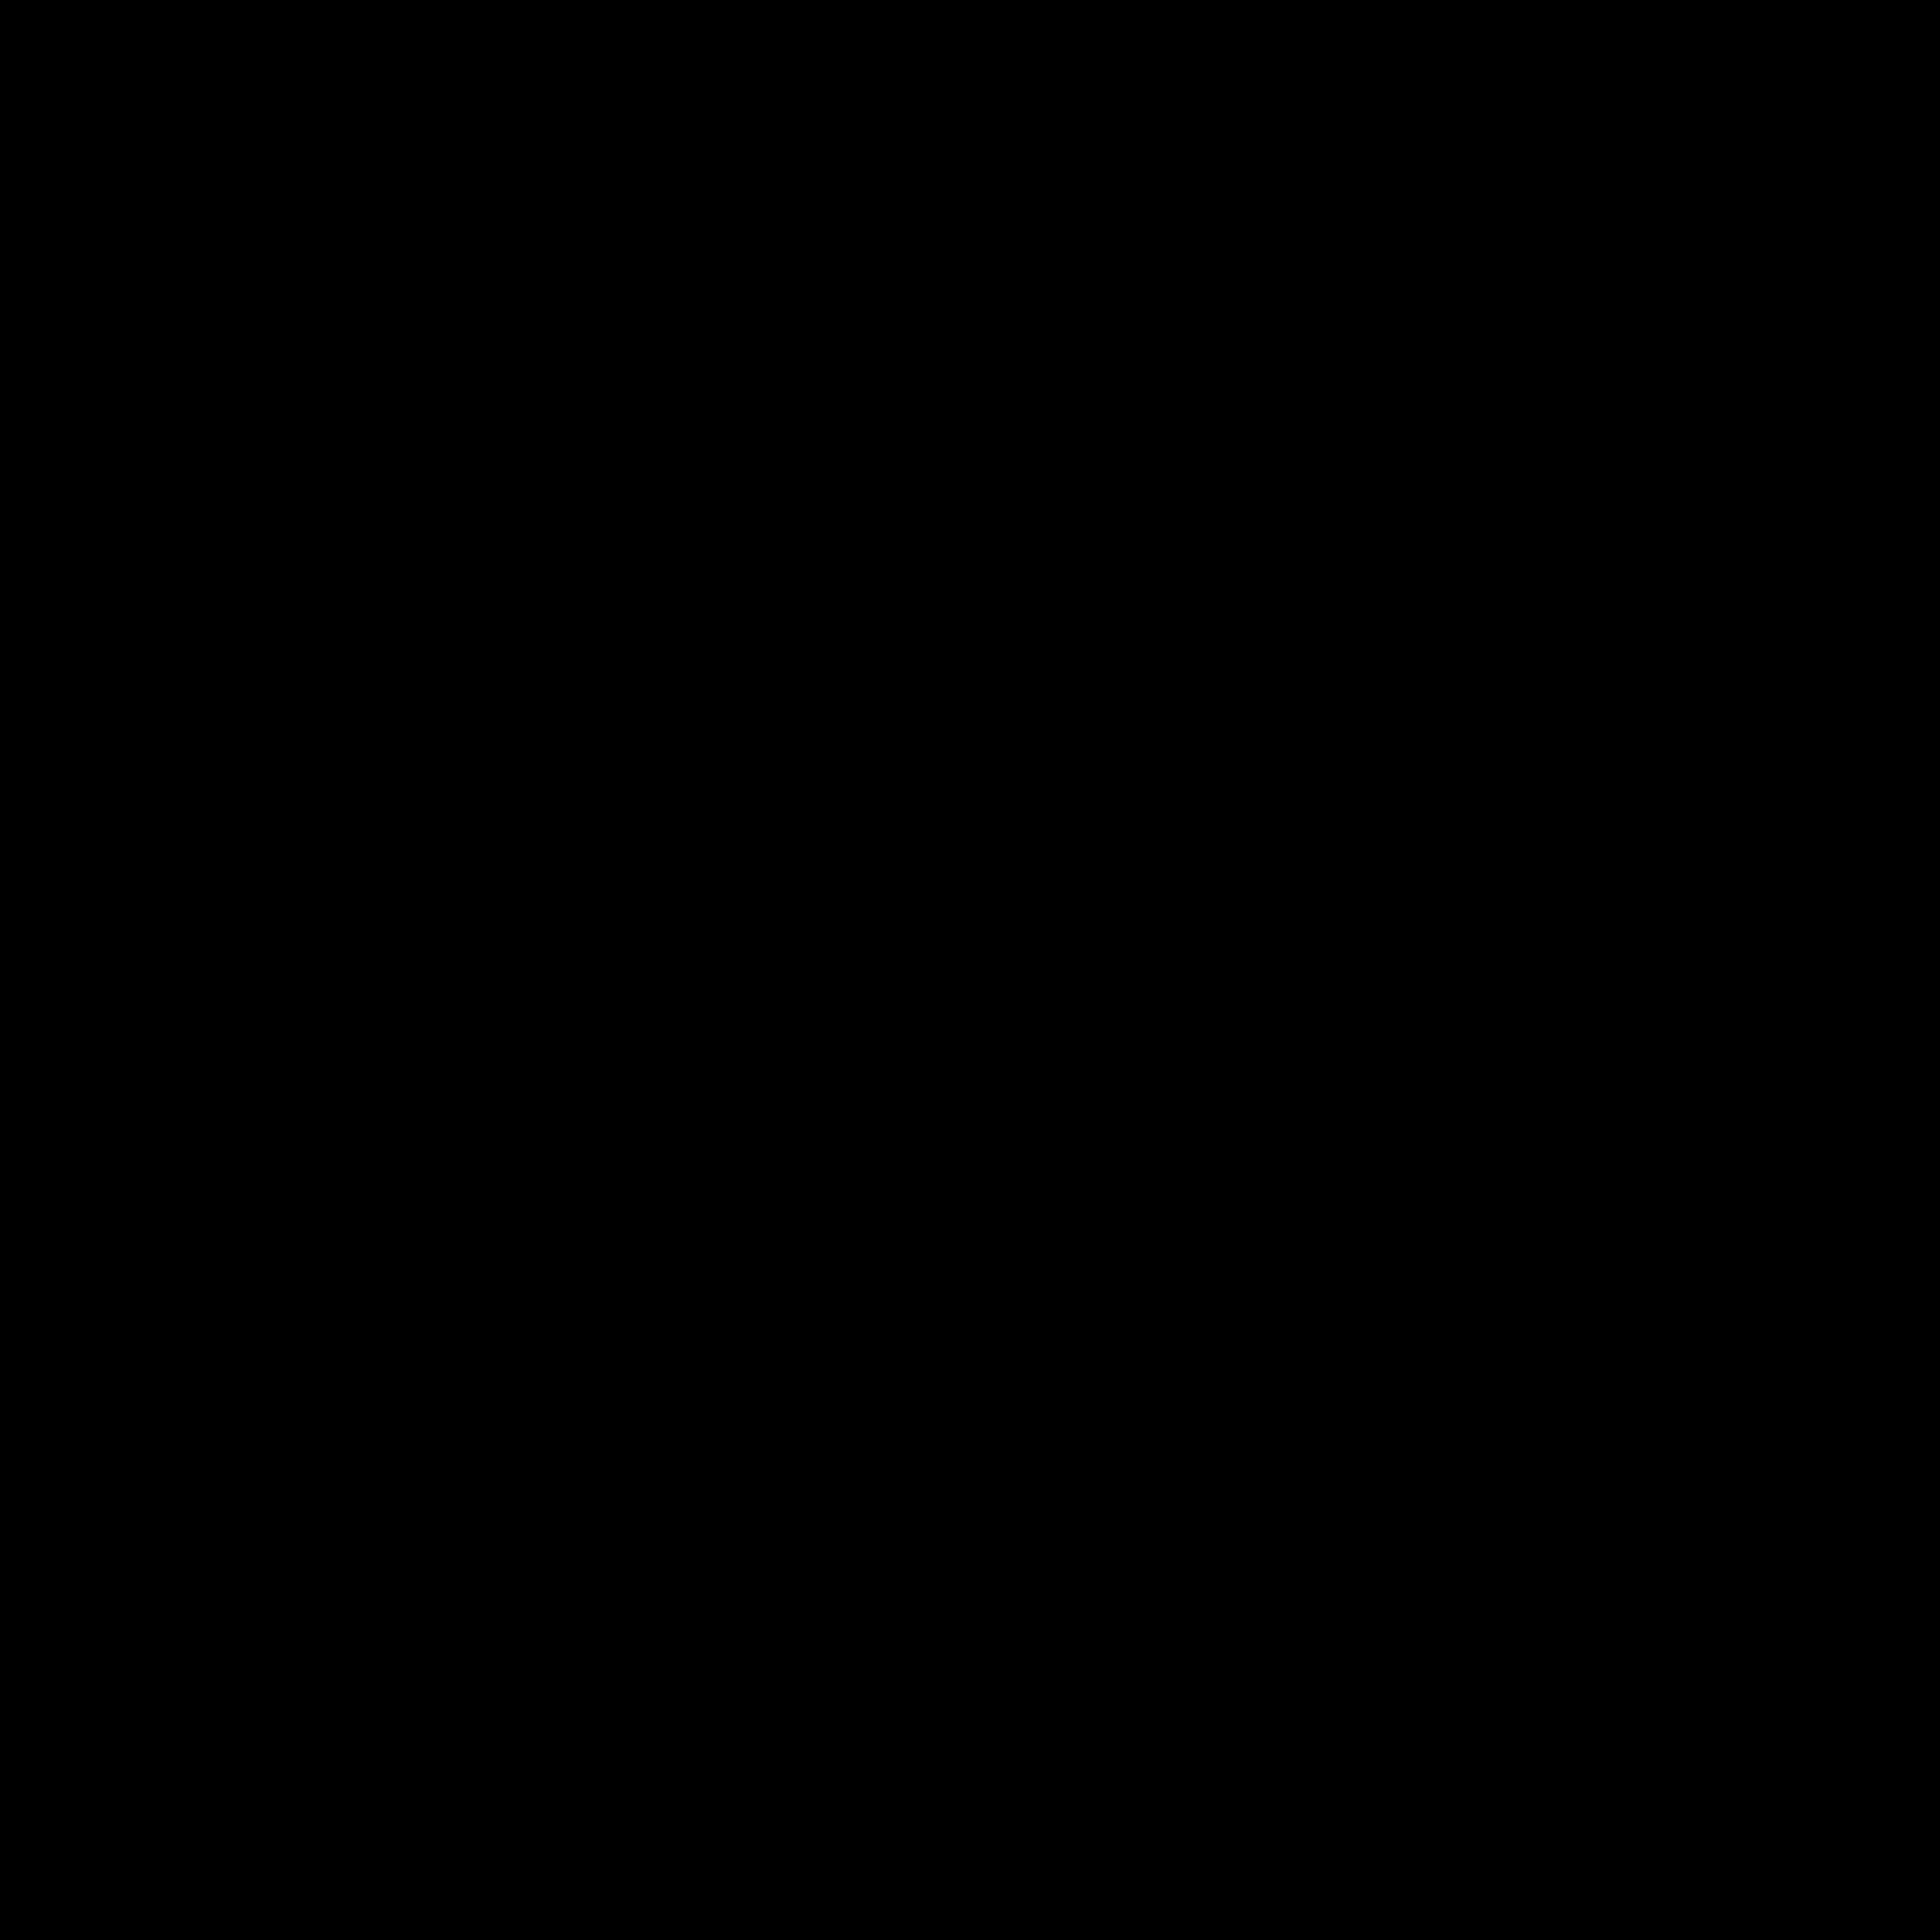 Juicy Online Media Logo Black